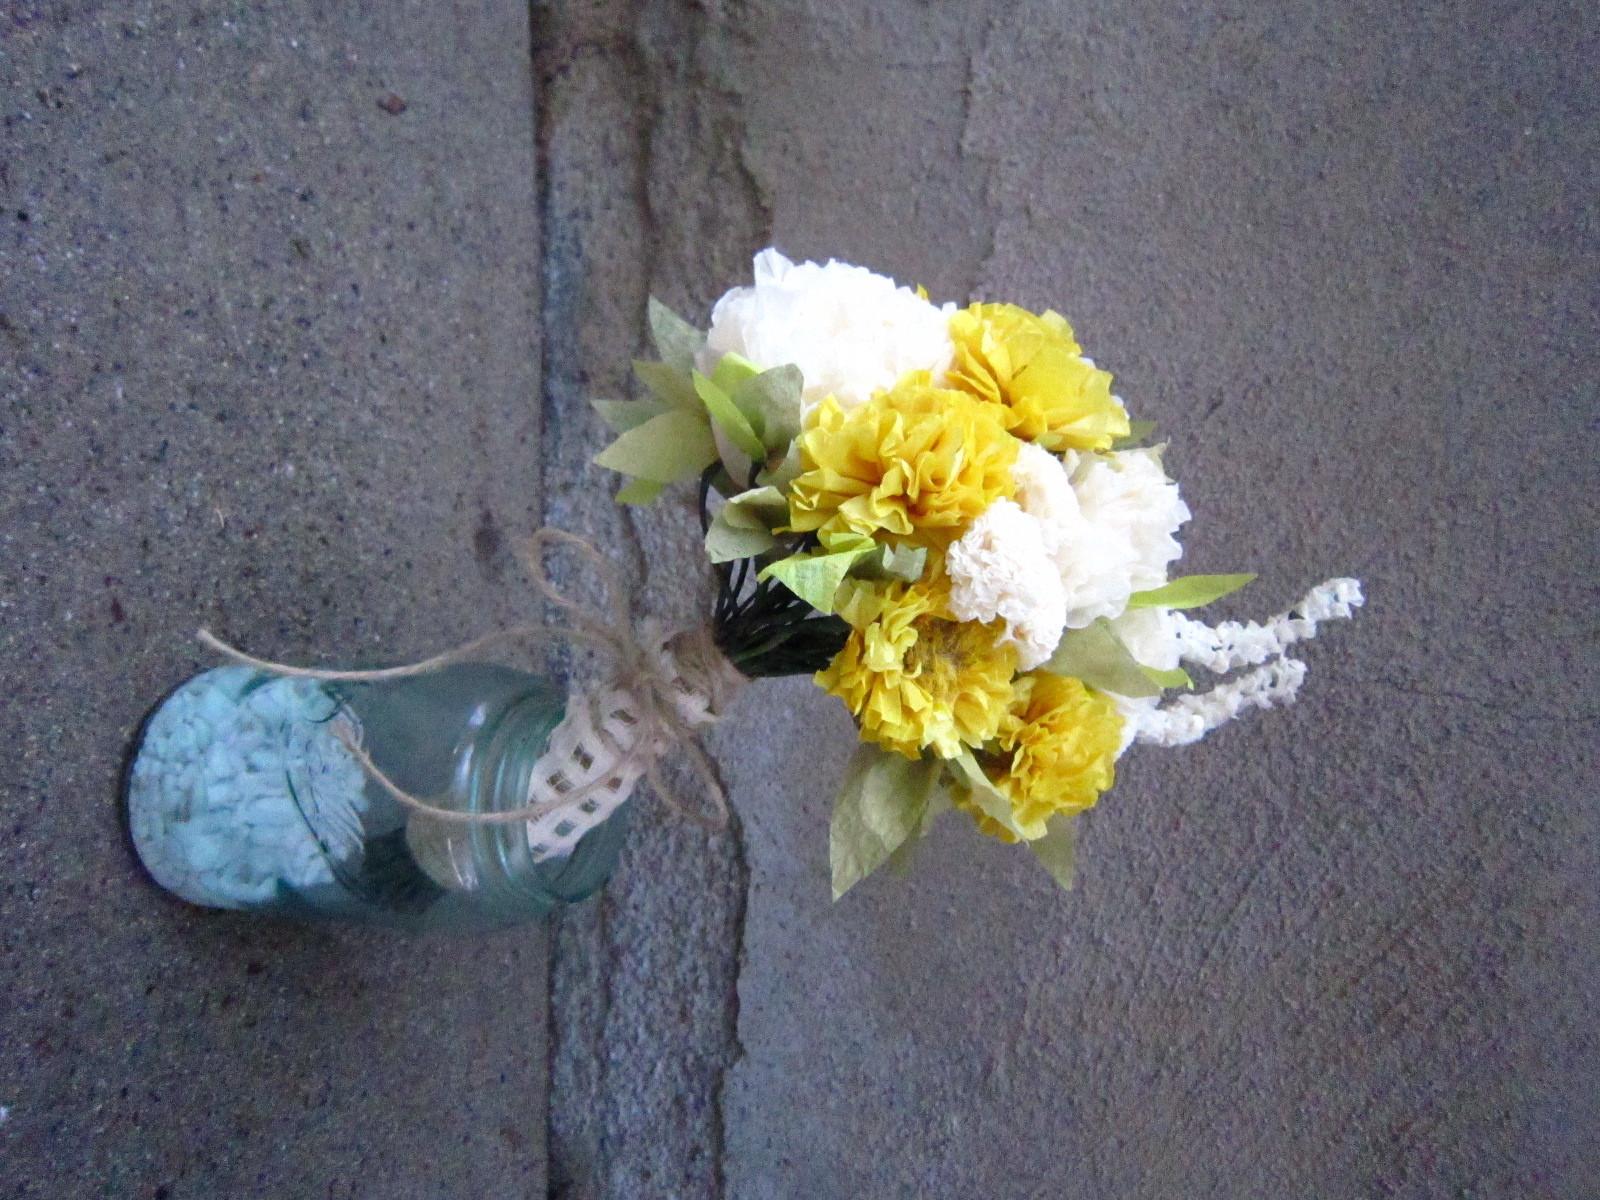 DIY, Flowers & Decor, Paper, yellow, Bride Bouquets, Bridesmaid Bouquets, Centerpieces, Bride, Flowers, Bouquet, Centerpiece, Wedding, Party, Bridesmaid, Cream, Artsy